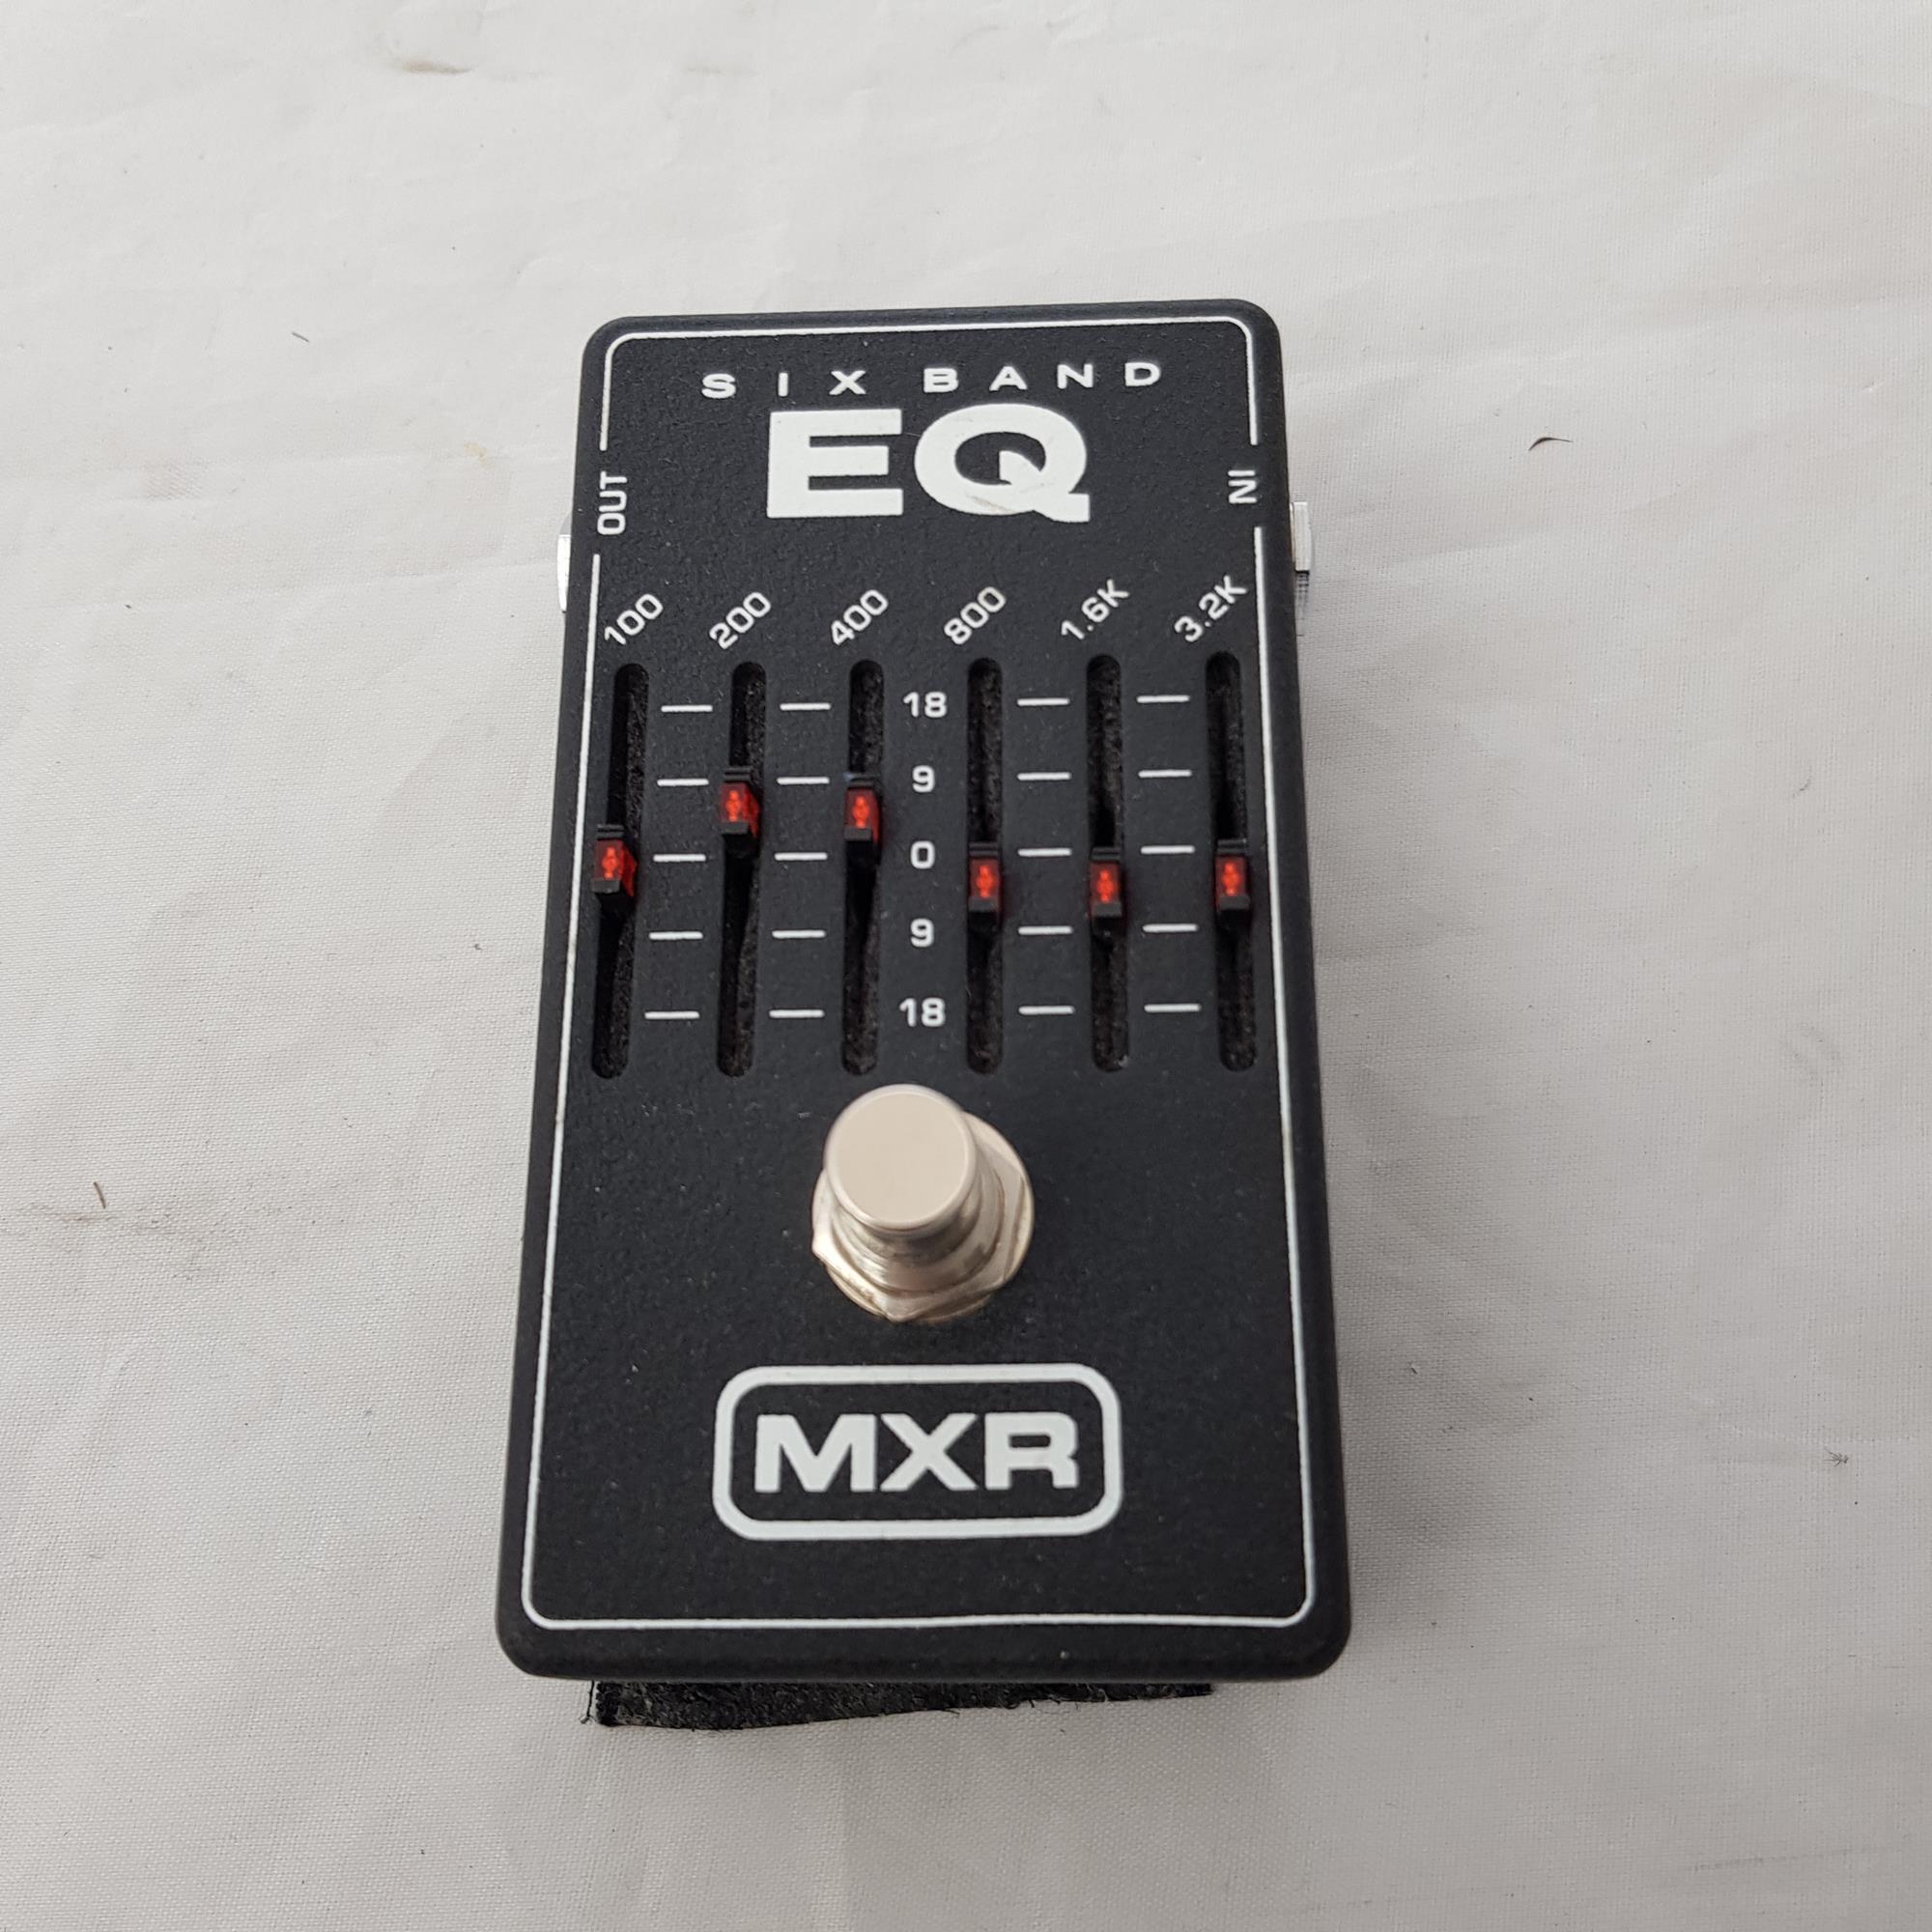 MXR-M-109-6-BAND-EQ-EQUALIZER-sku-1618657998705